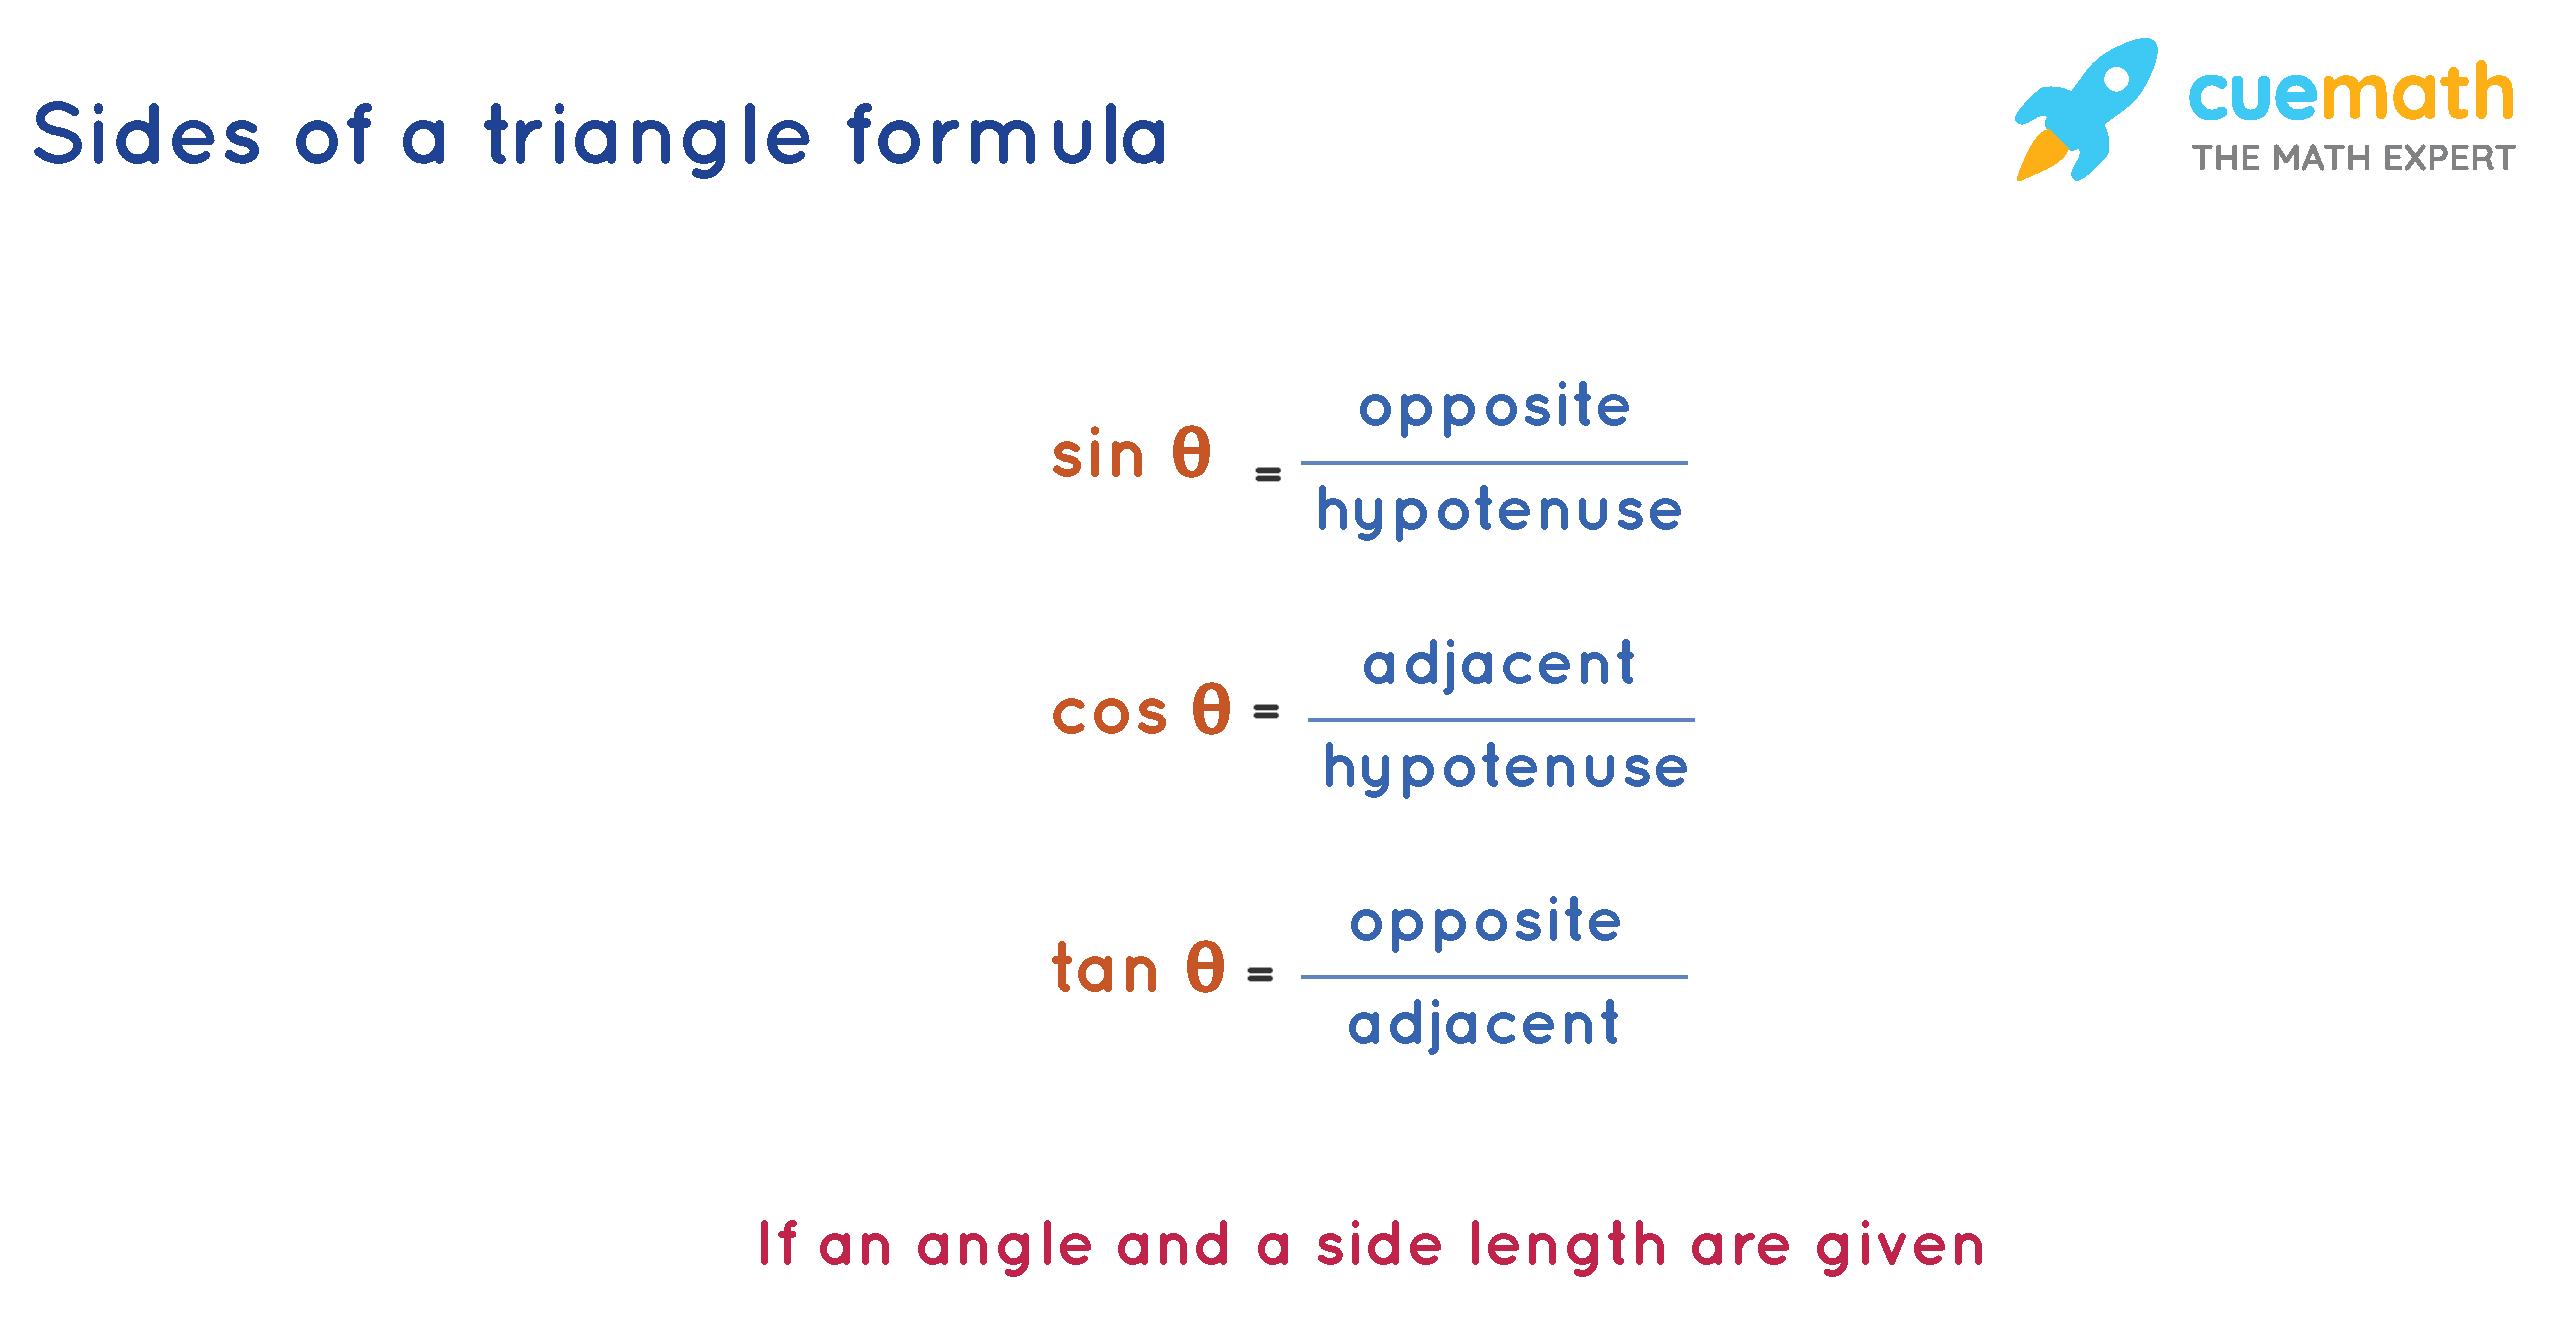 sides of a triangle formula